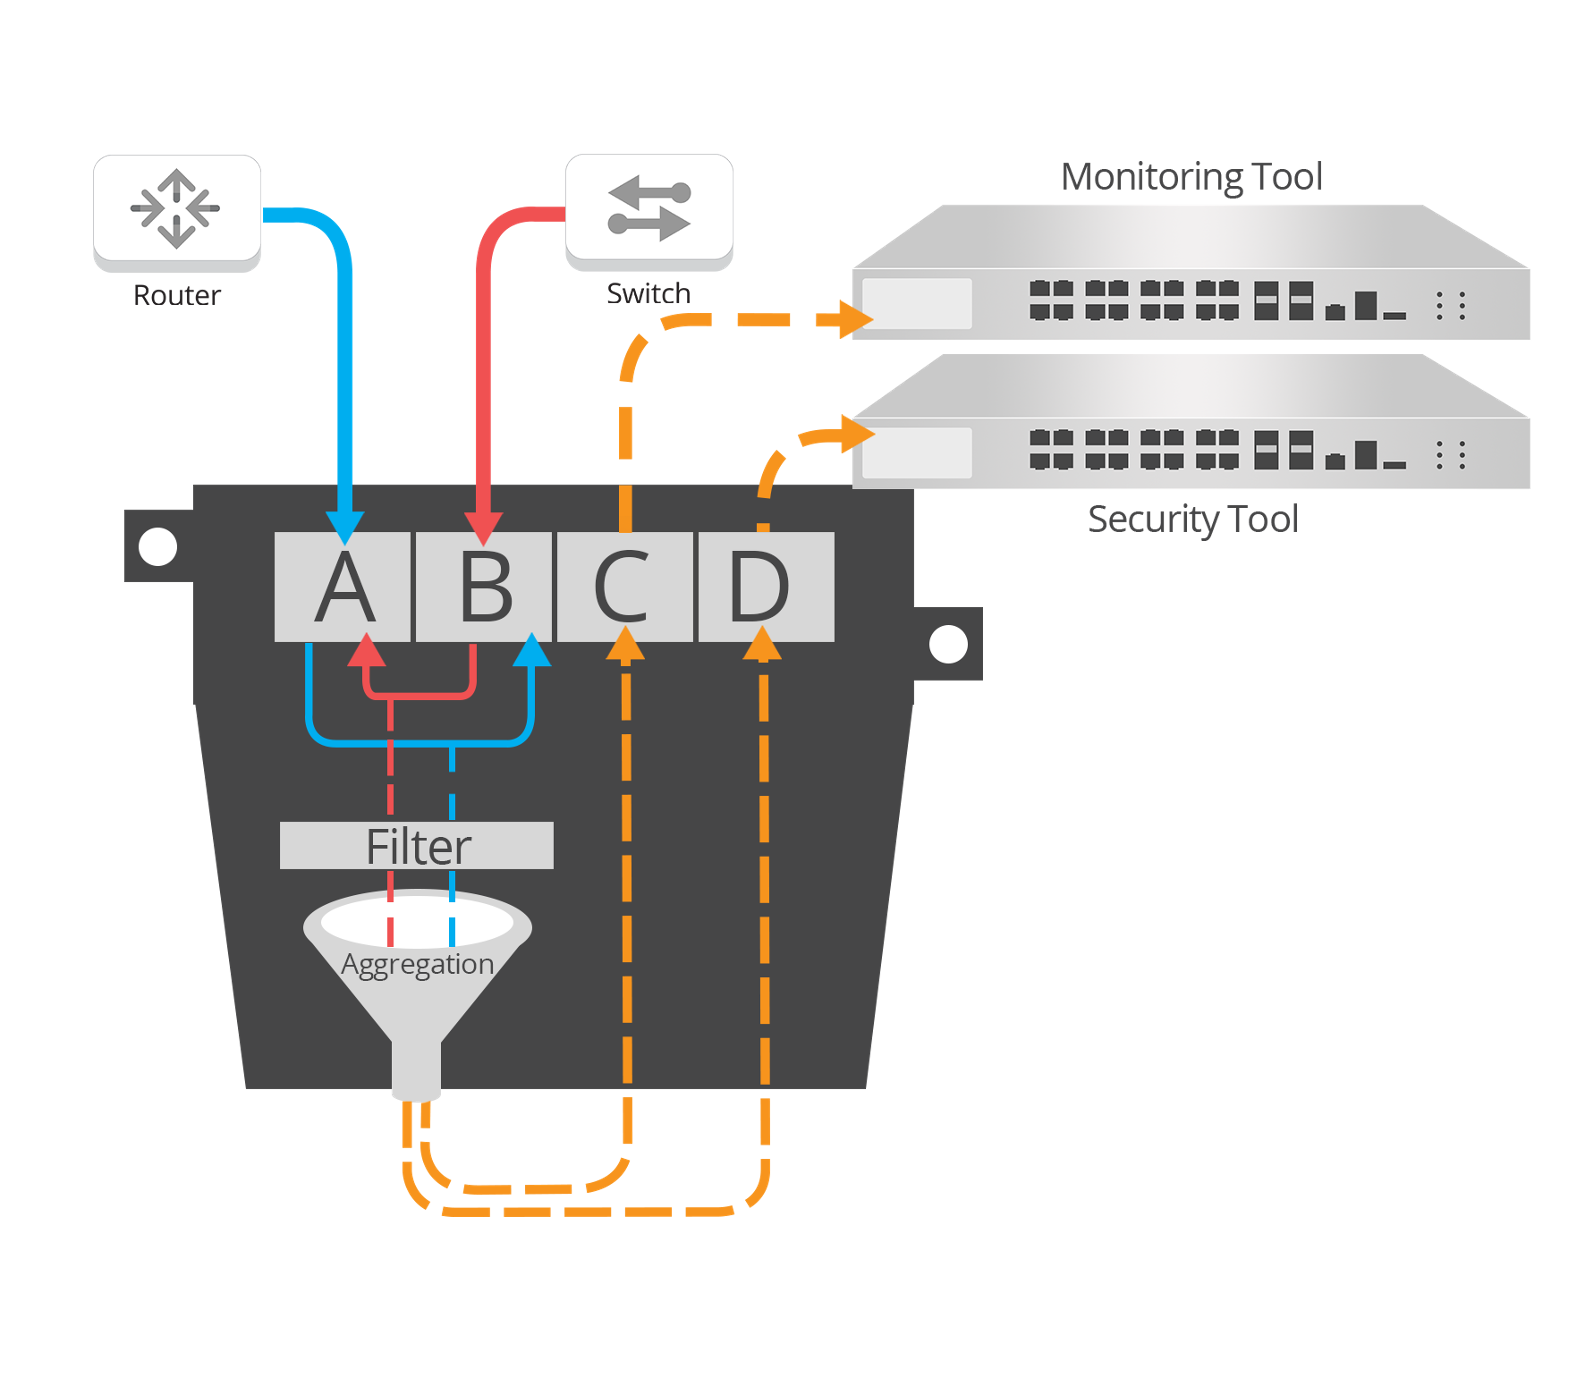 garland wiring diagram: garland network filtering taps